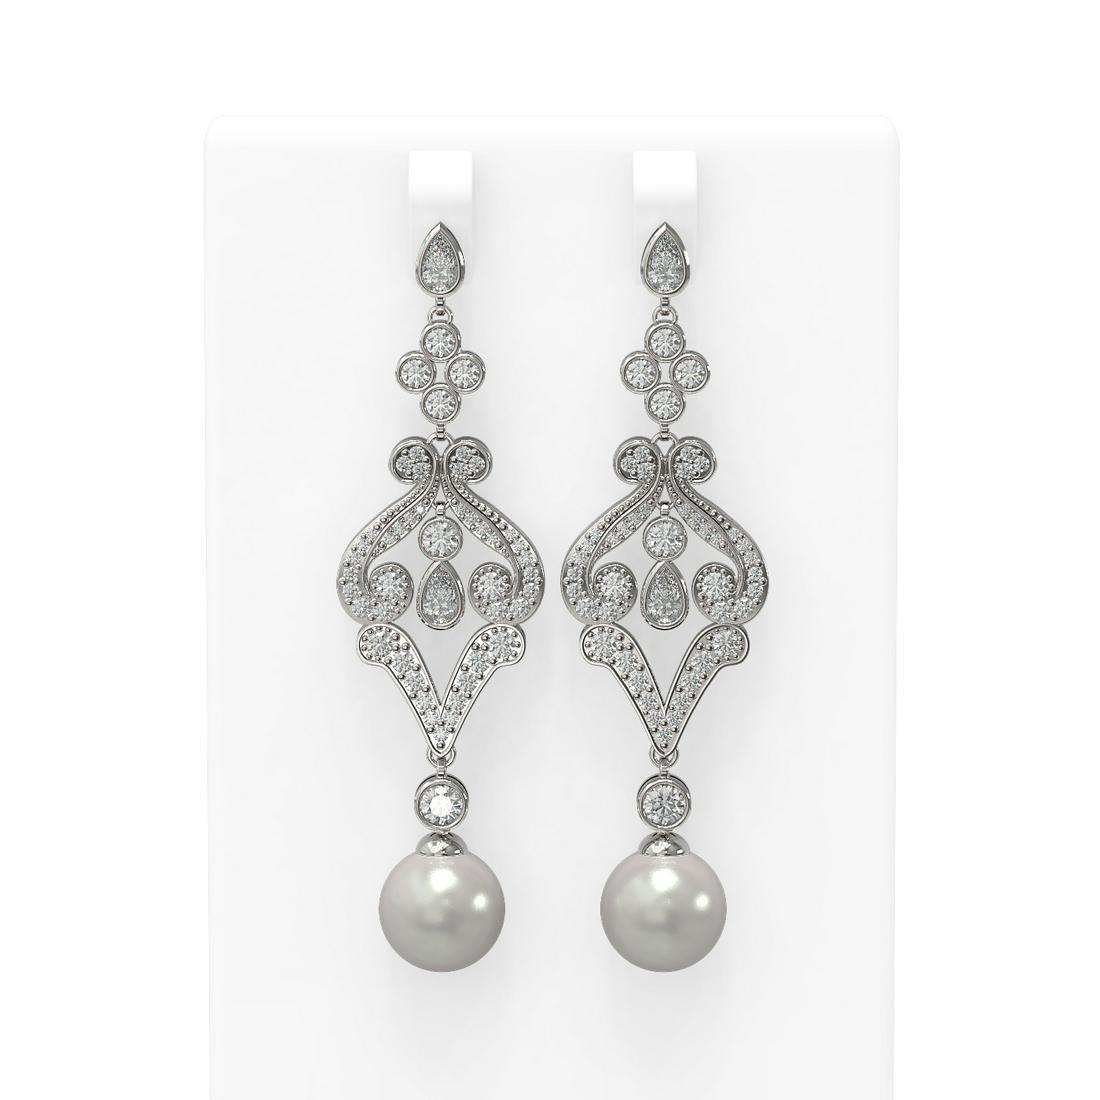 4.57 ctw Diamond & Pearl Earrings 18K White Gold -